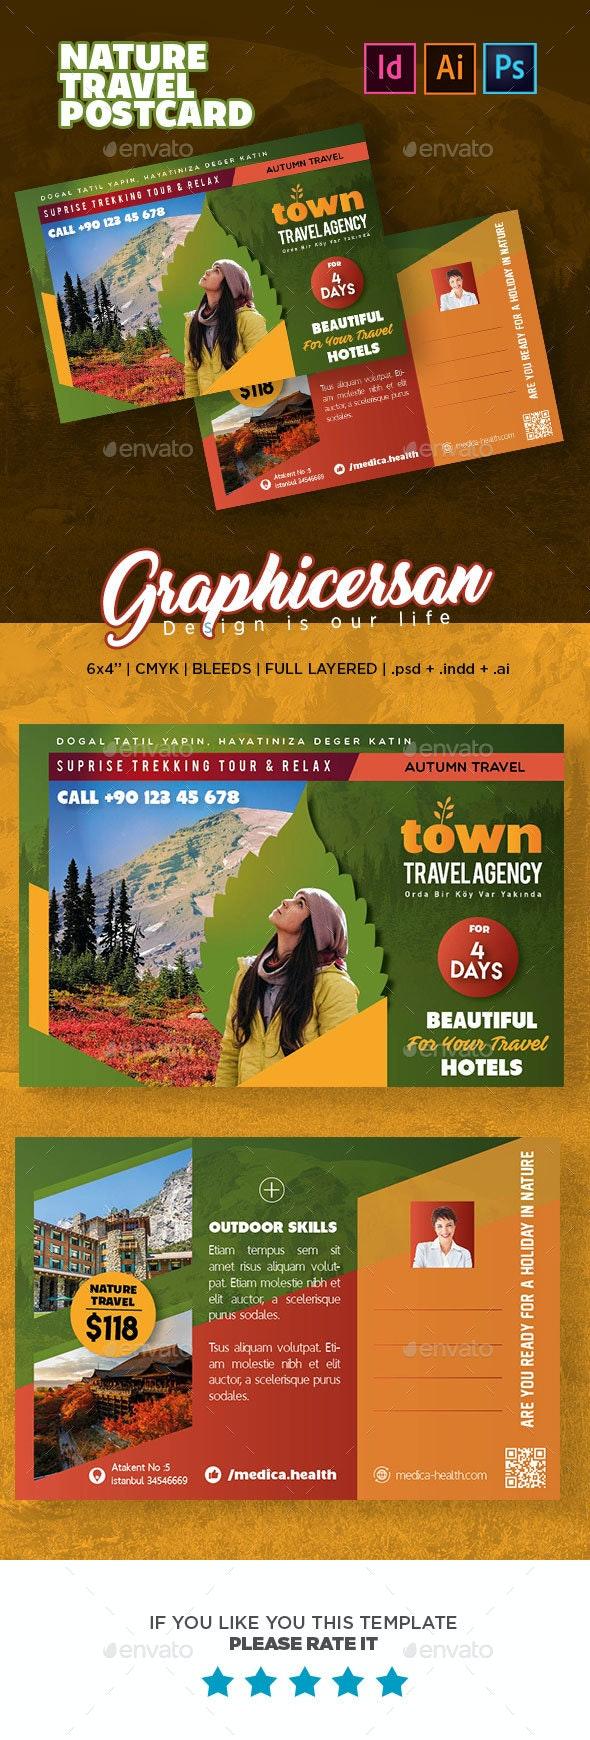 Nature Travel Postcard Templates - Cards & Invites Print Templates